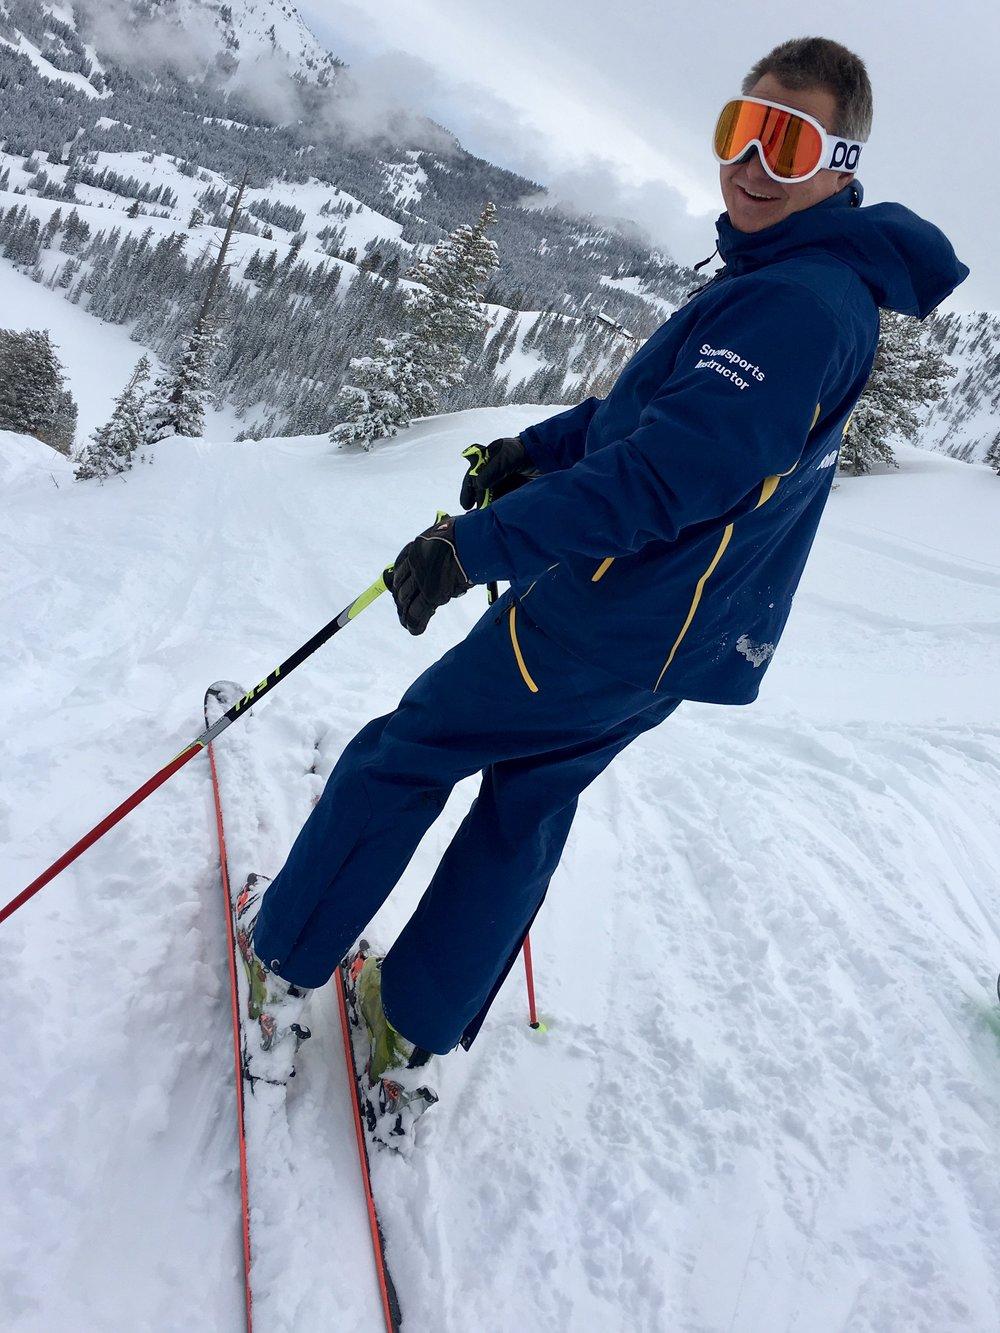 Solitude Mountain Resort Hidden Tracks guide Gregg Griffiths. (@BeingAlexP)